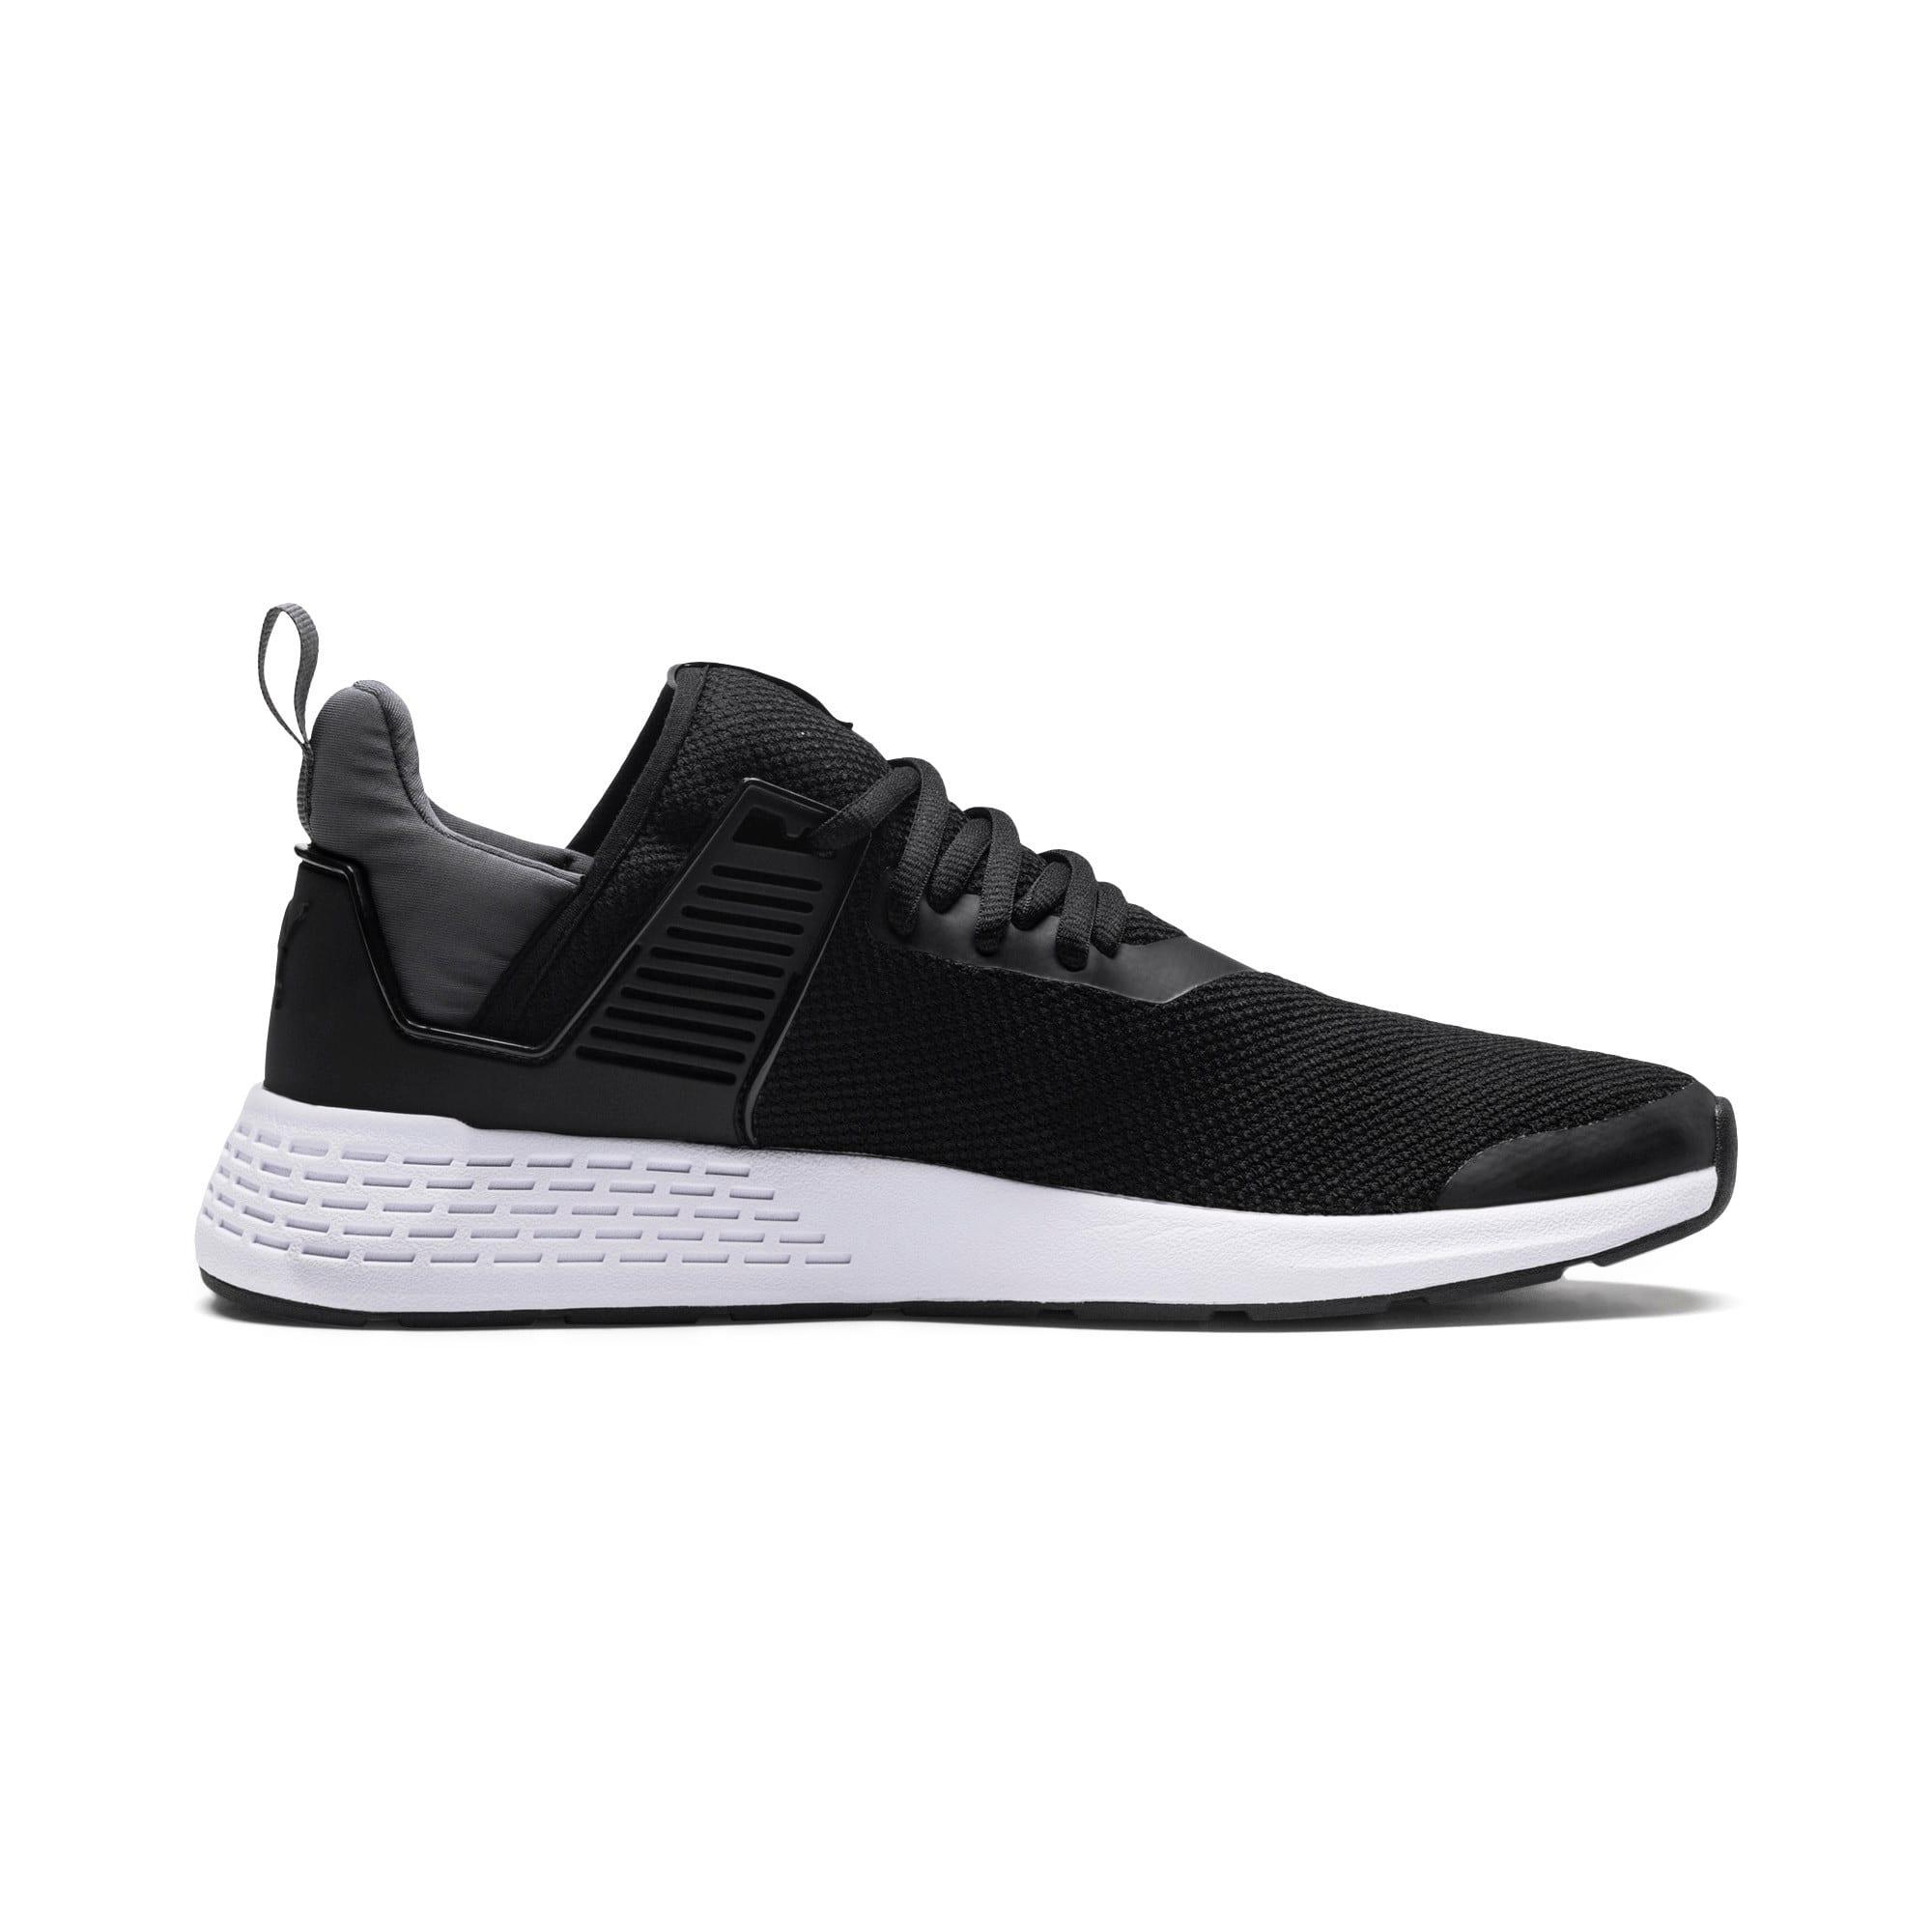 Puma Unisex's Insurge Mesh Sneakers